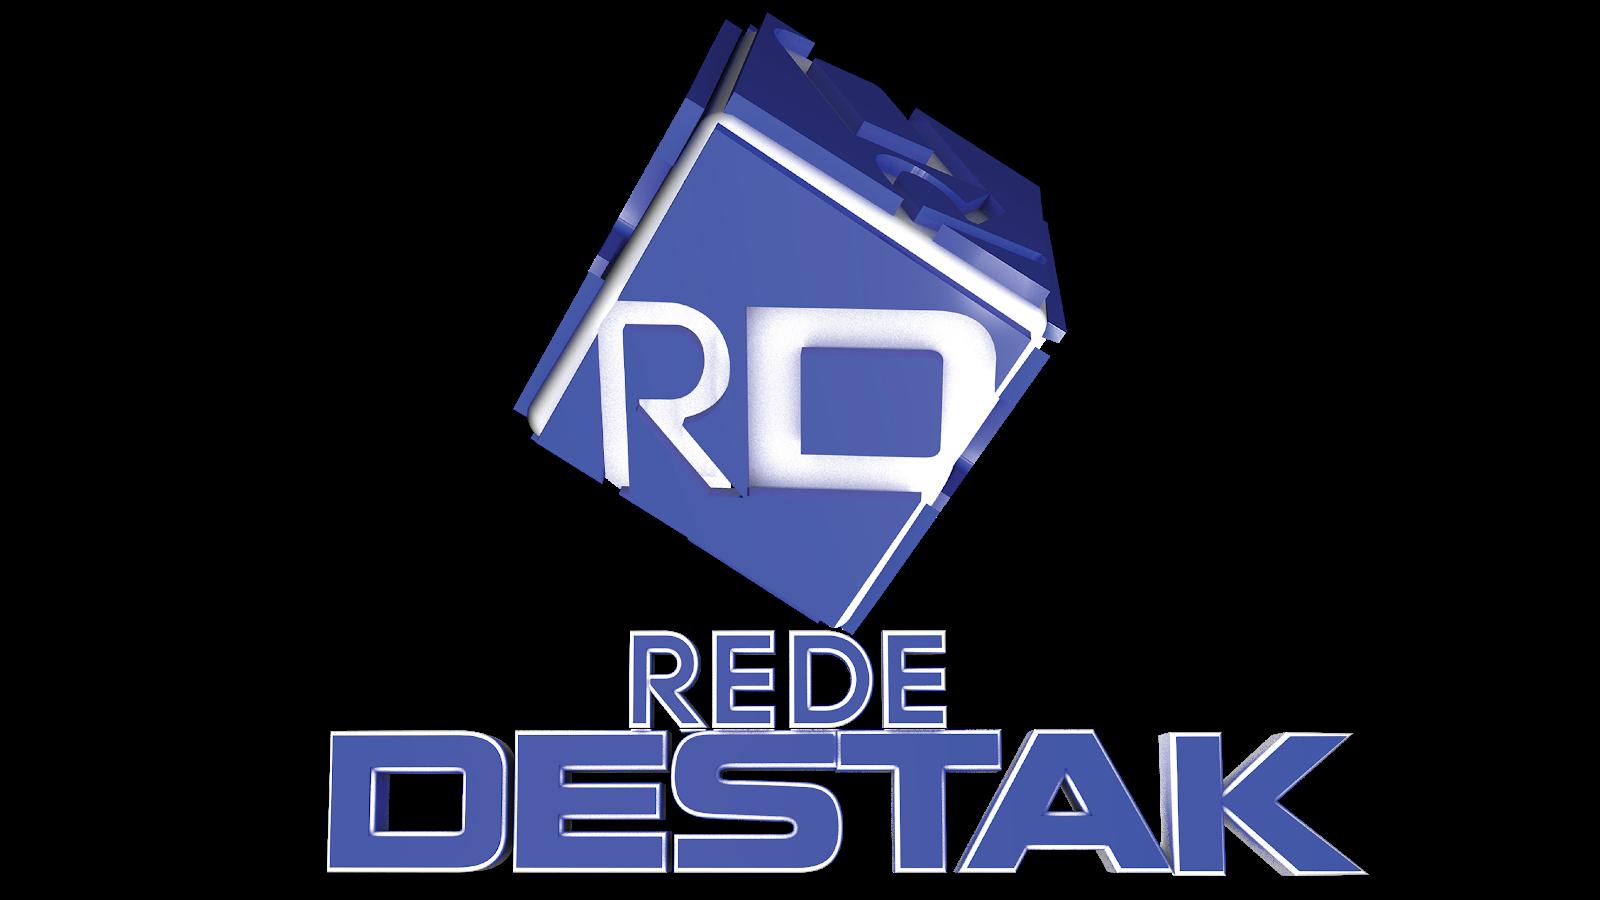 Rede Destak